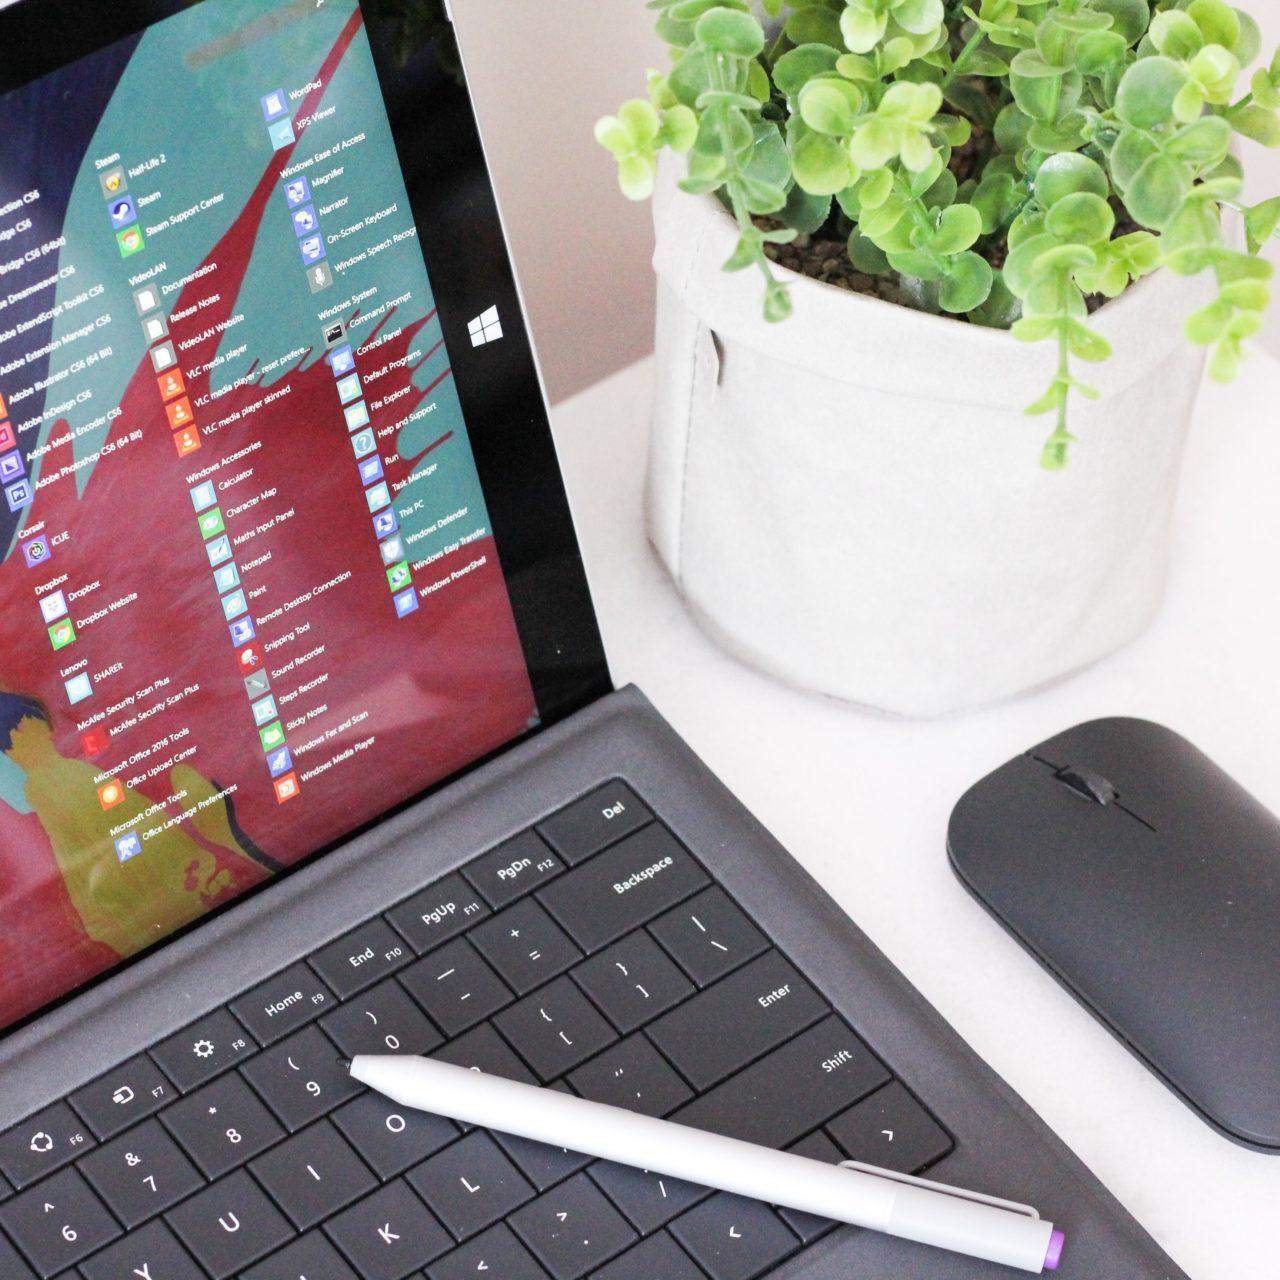 Microsoft laptop and a mouse next to a pot plants